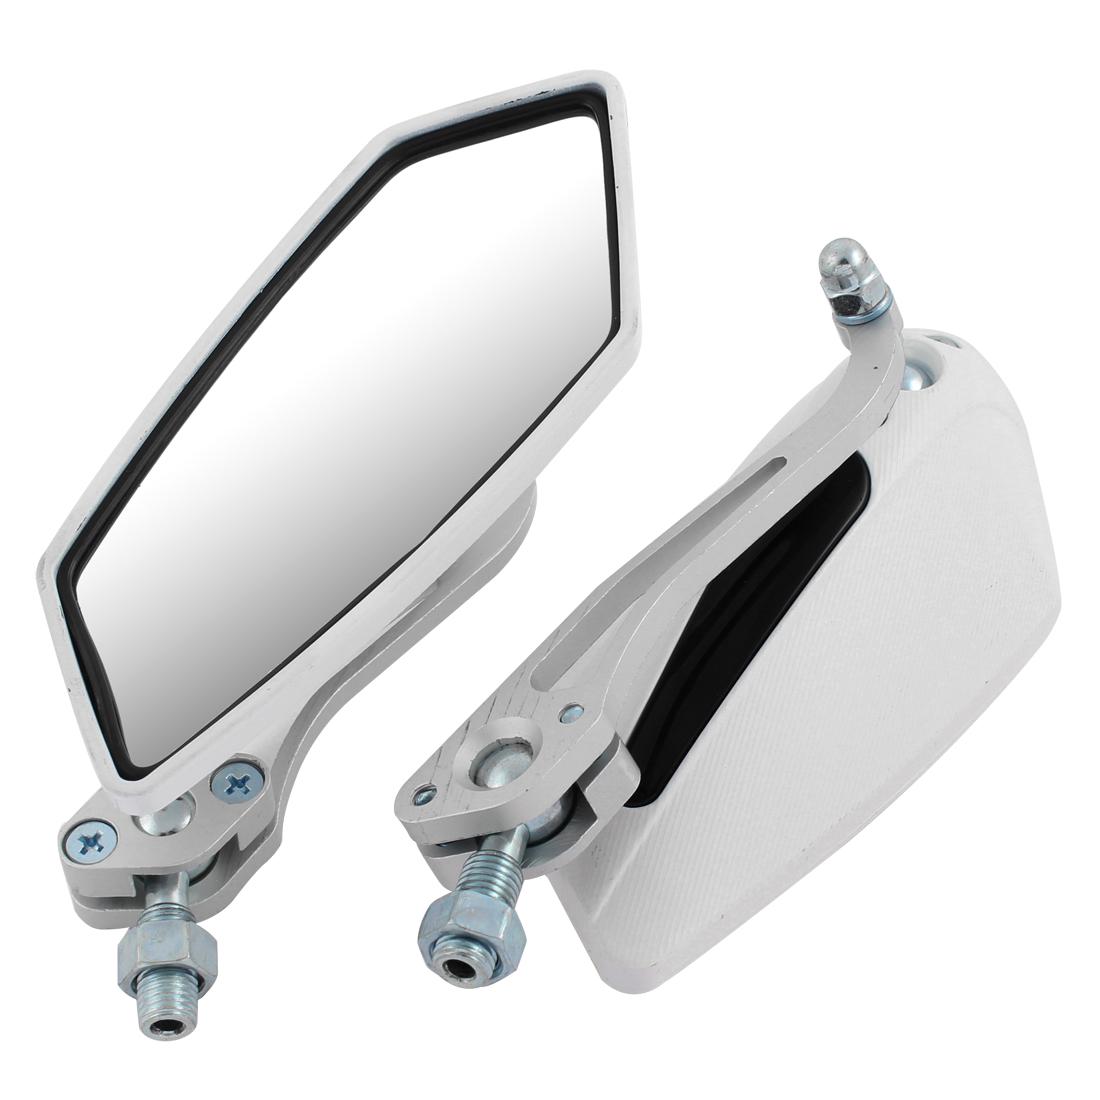 2 Pcs White Polygon Shaped Motorcycle Blind Spot Rear View Mirror